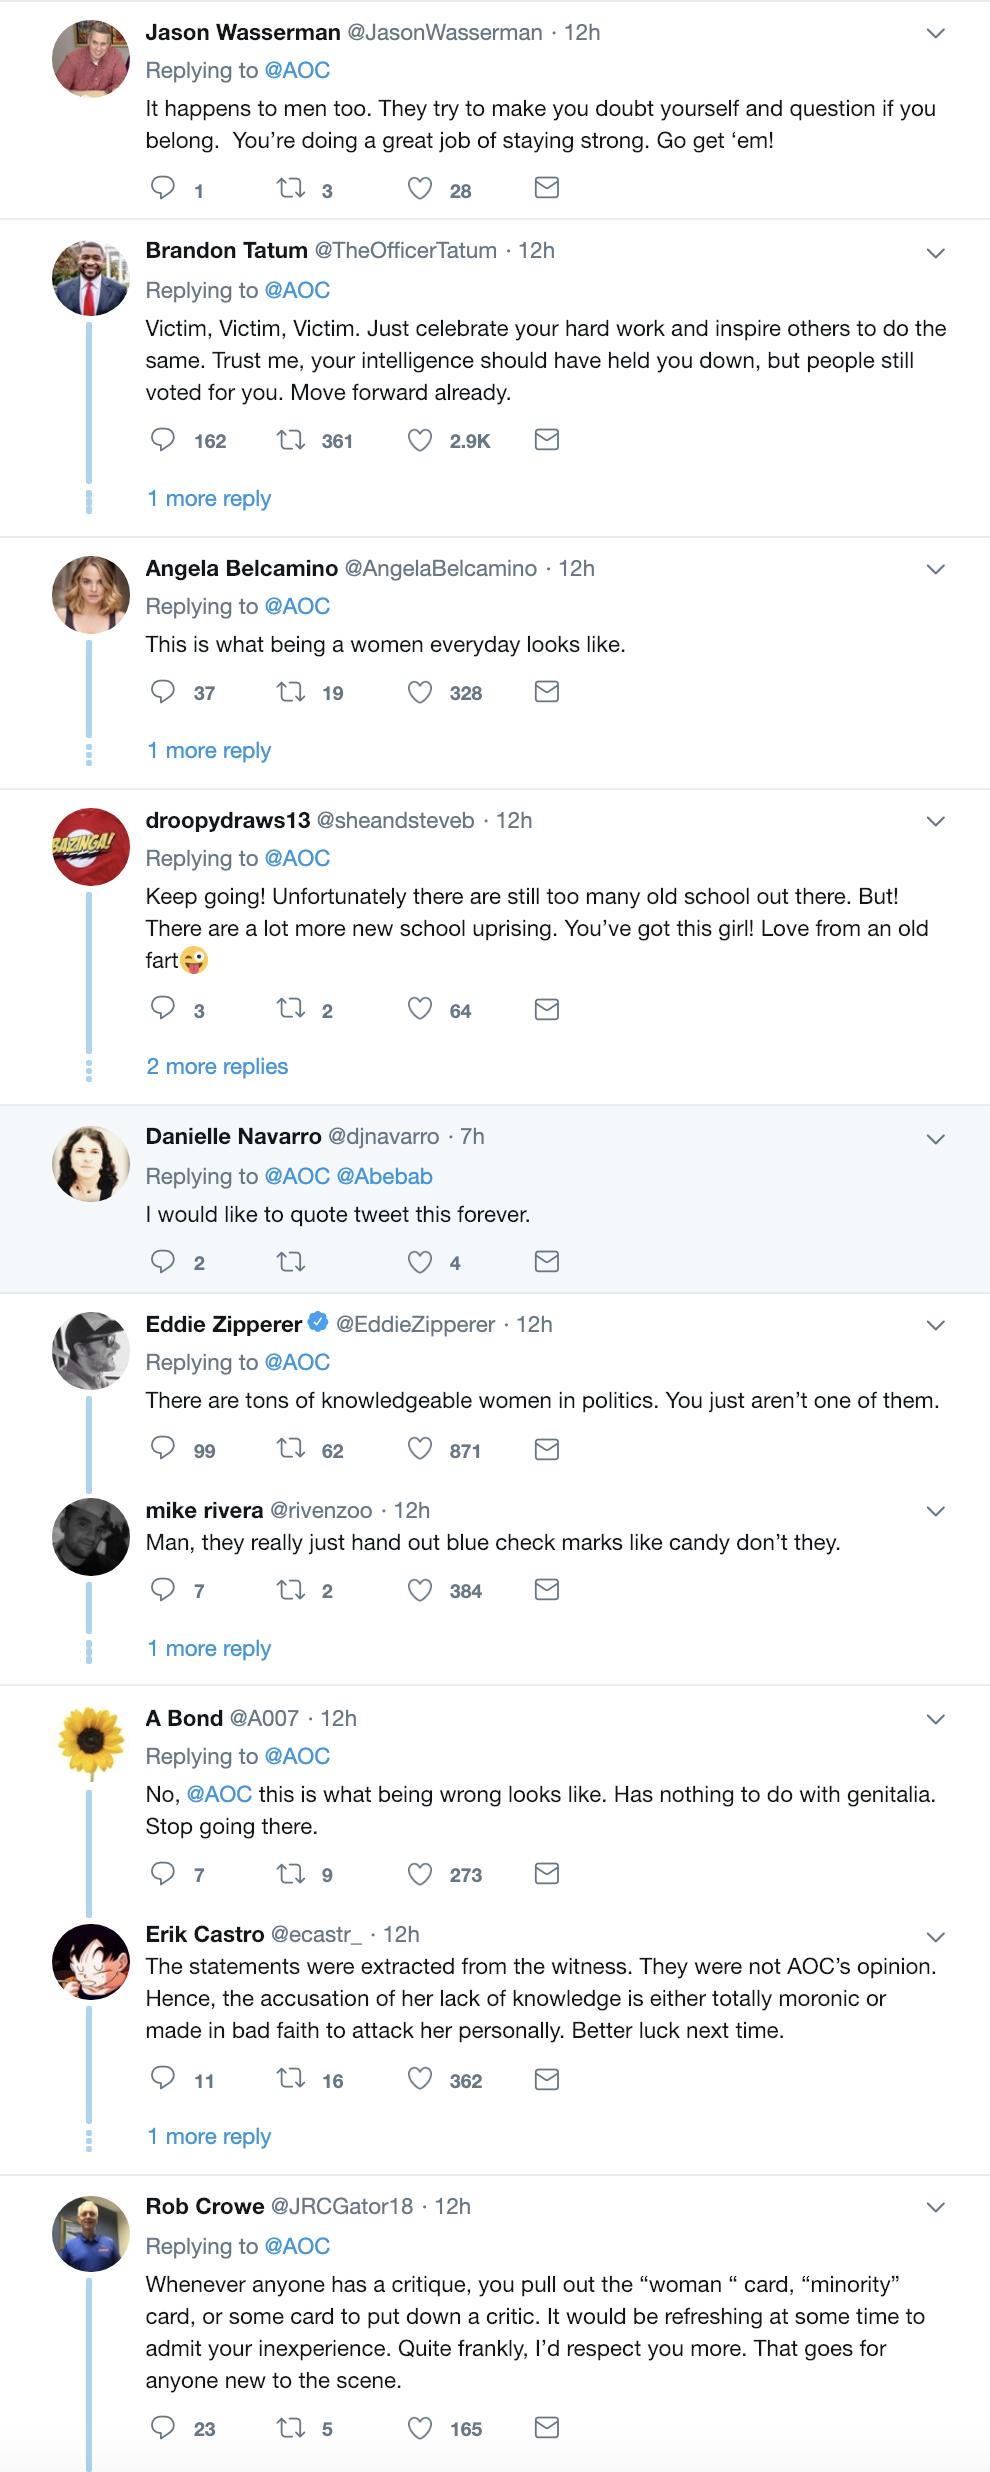 Screen-Shot-2019-02-05-at-9.08.54-AM Ocasio-Cortez Calls Out Attacker Dissing Women Like A Mega Boss Corruption Crime Domestic Policy Donald Trump Healthcare Politics Top Stories